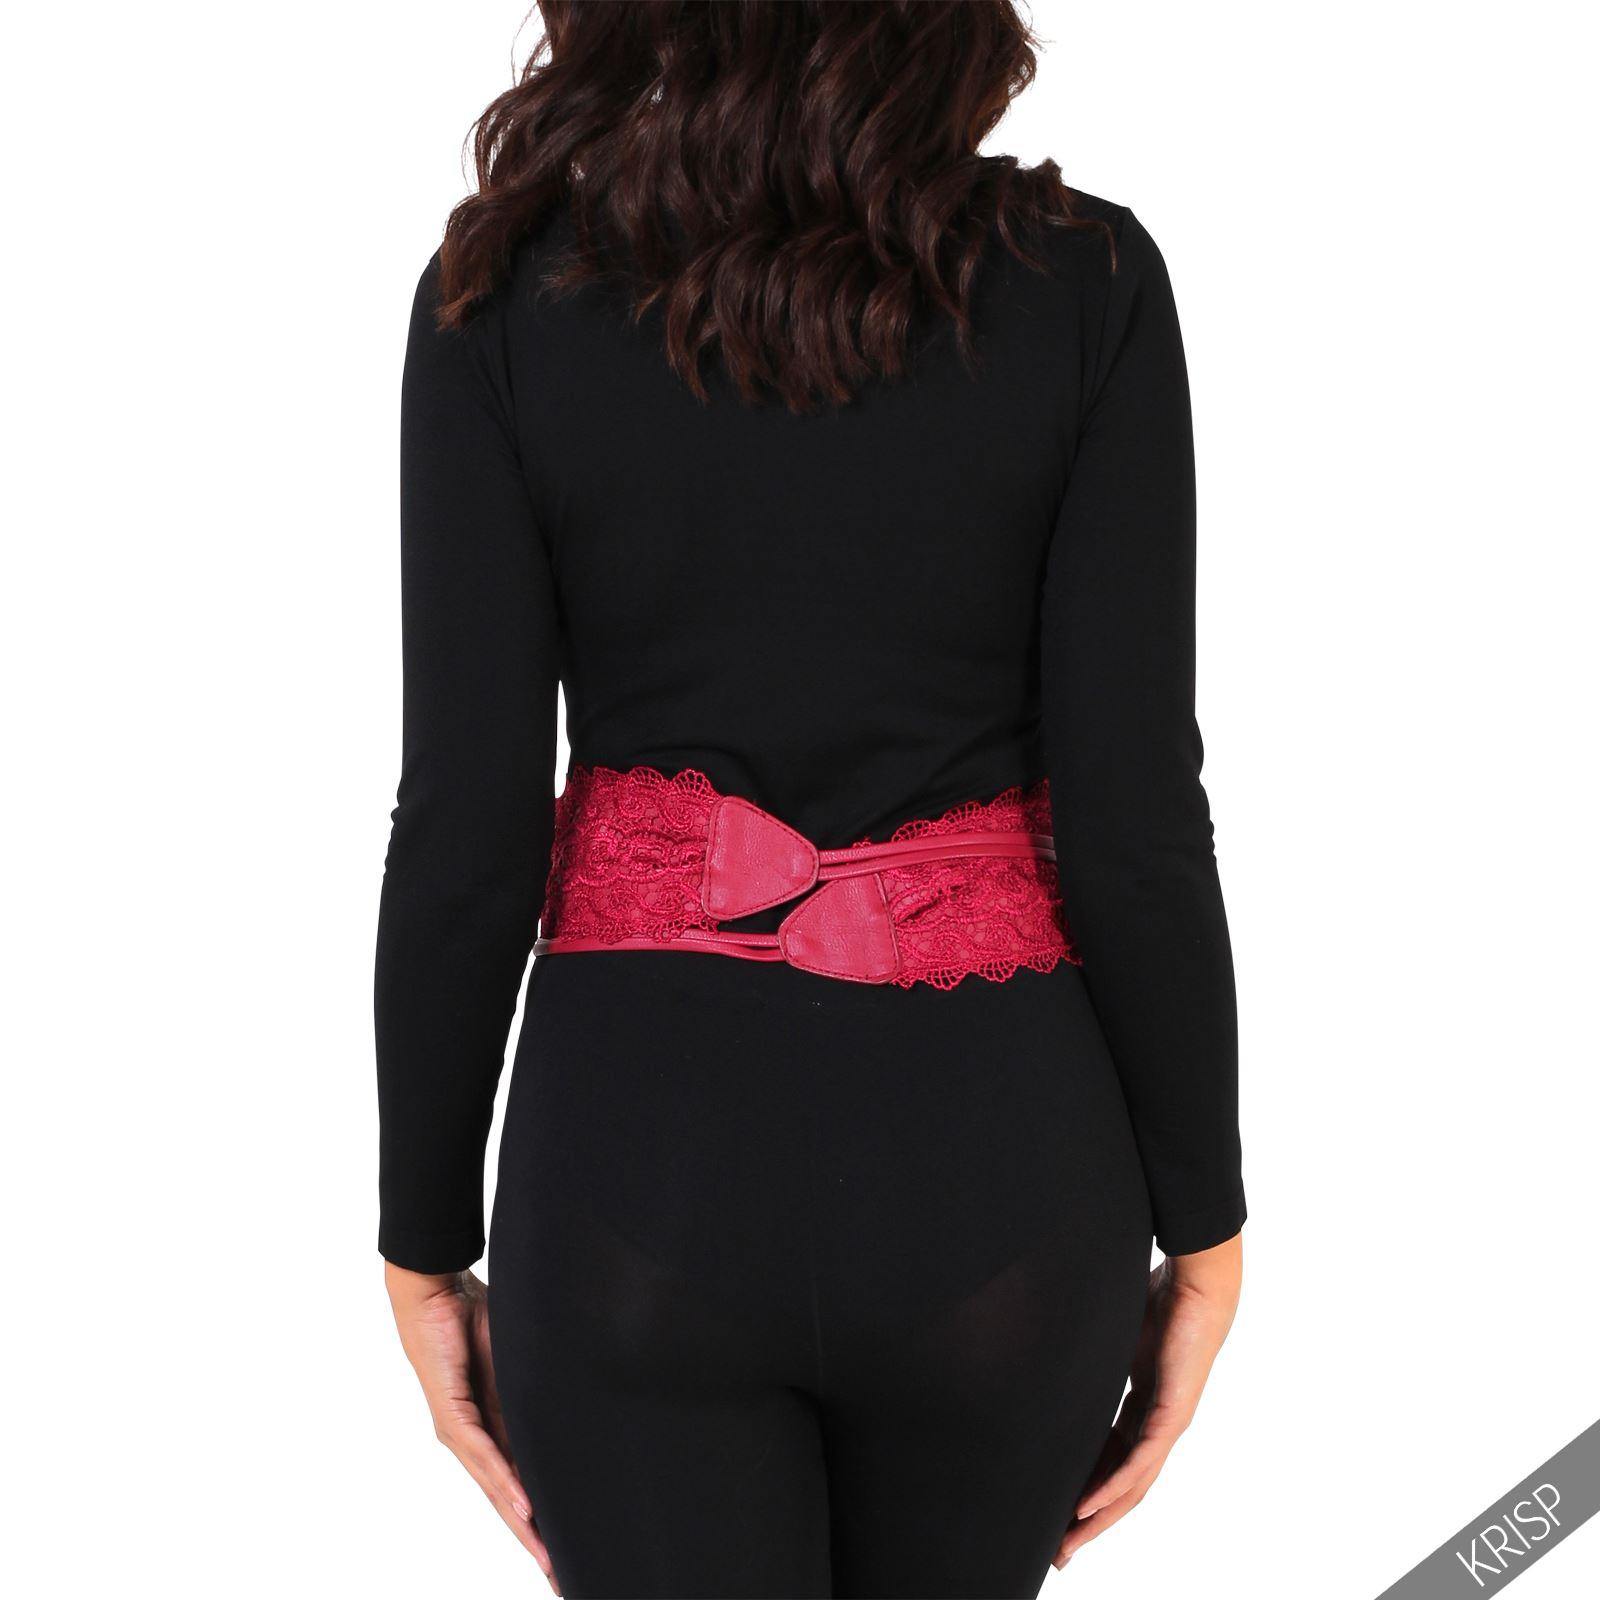 thumbnail 65 - Womens-Ladies-Wide-Waist-Belt-Floral-Waistband-Pattern-Band-Crochet-Lace-Corset